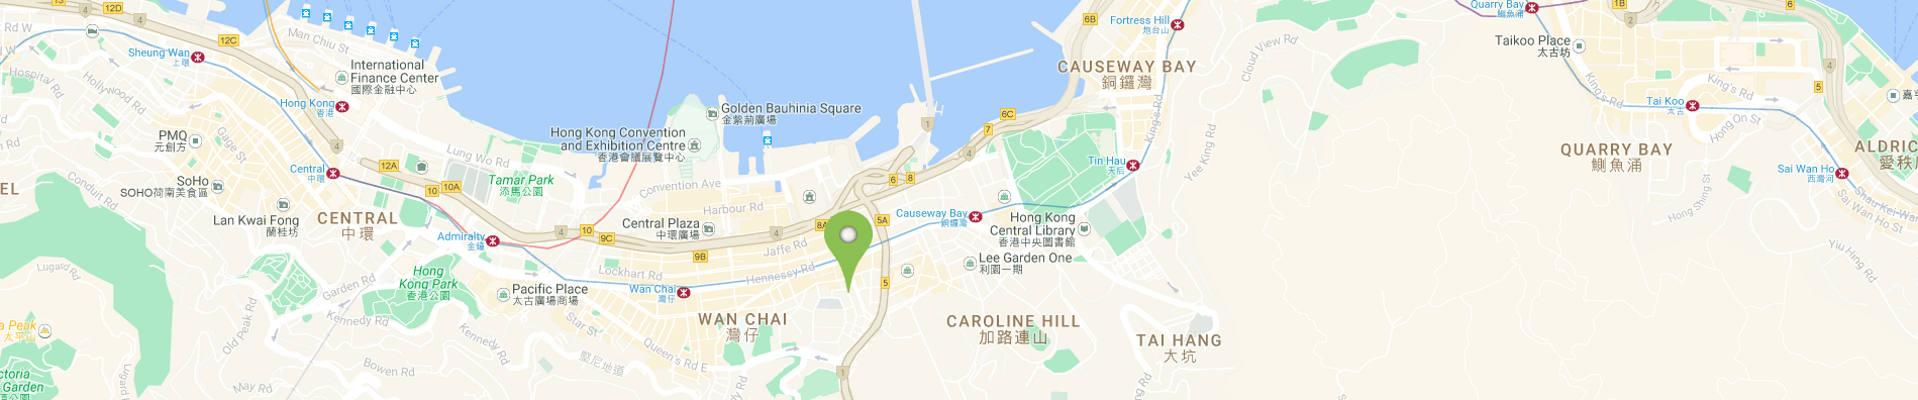 Headquarters_map_large